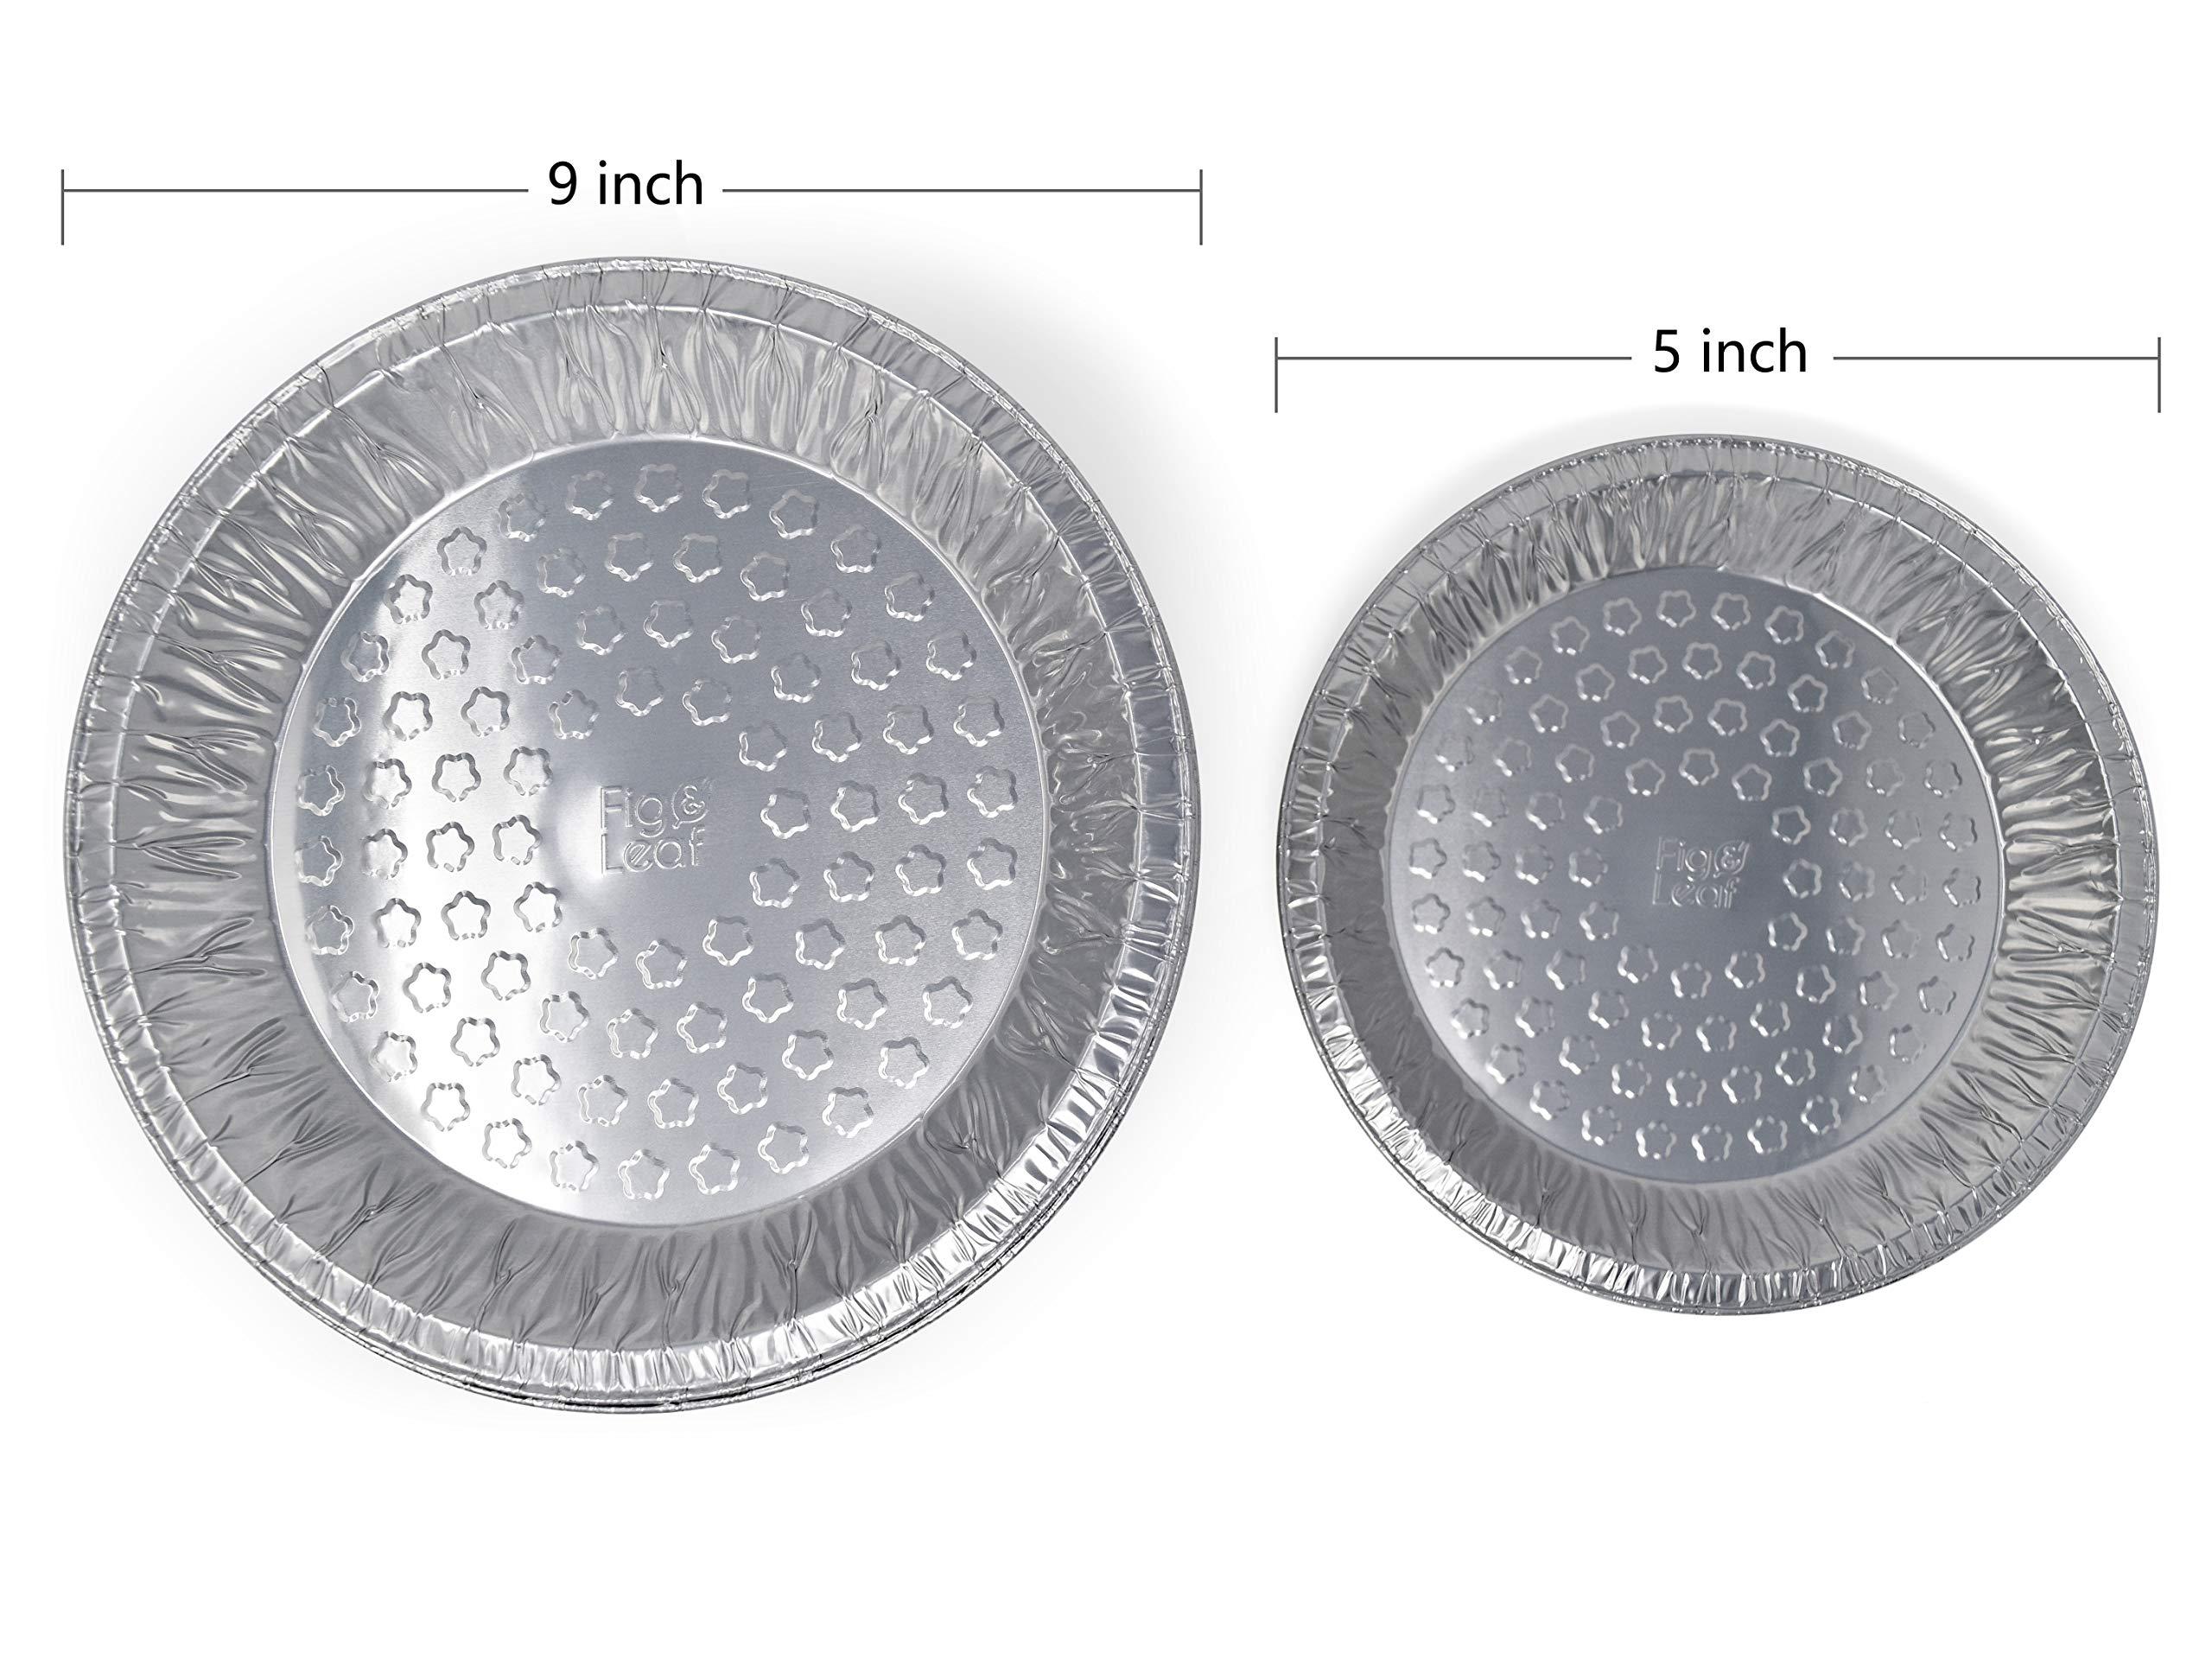 Fig & Leaf (120 Pack) Premium 9-Inch Pie Pans l 36 Gauge l Disposable Tart Pan Tin Plates Aluminum Foil for Baking Quiche by Fig & Leaf (Image #4)